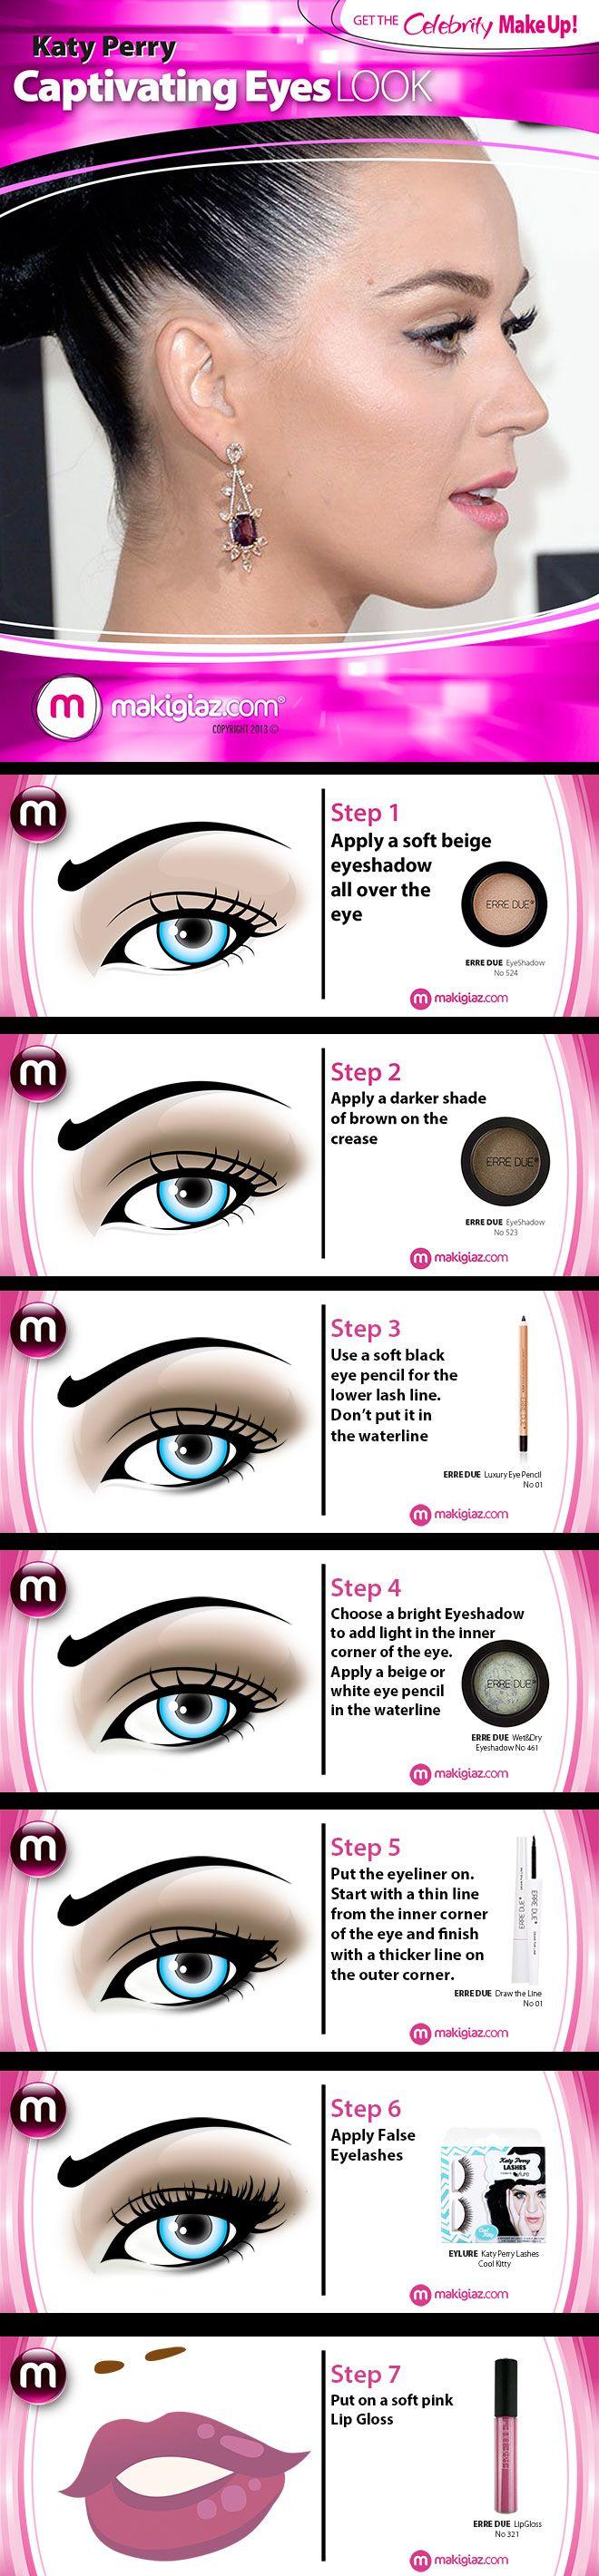 Get The Celebrity Look – Katy Perry's Captivating Eyes English article http://makigiaz.com/blog/gtc-look-katy-perry-captivating-eyes-en/ Greek Article http://makigiaz.com/blog/gtc-look-katy-perry-captivating-eyes-en/